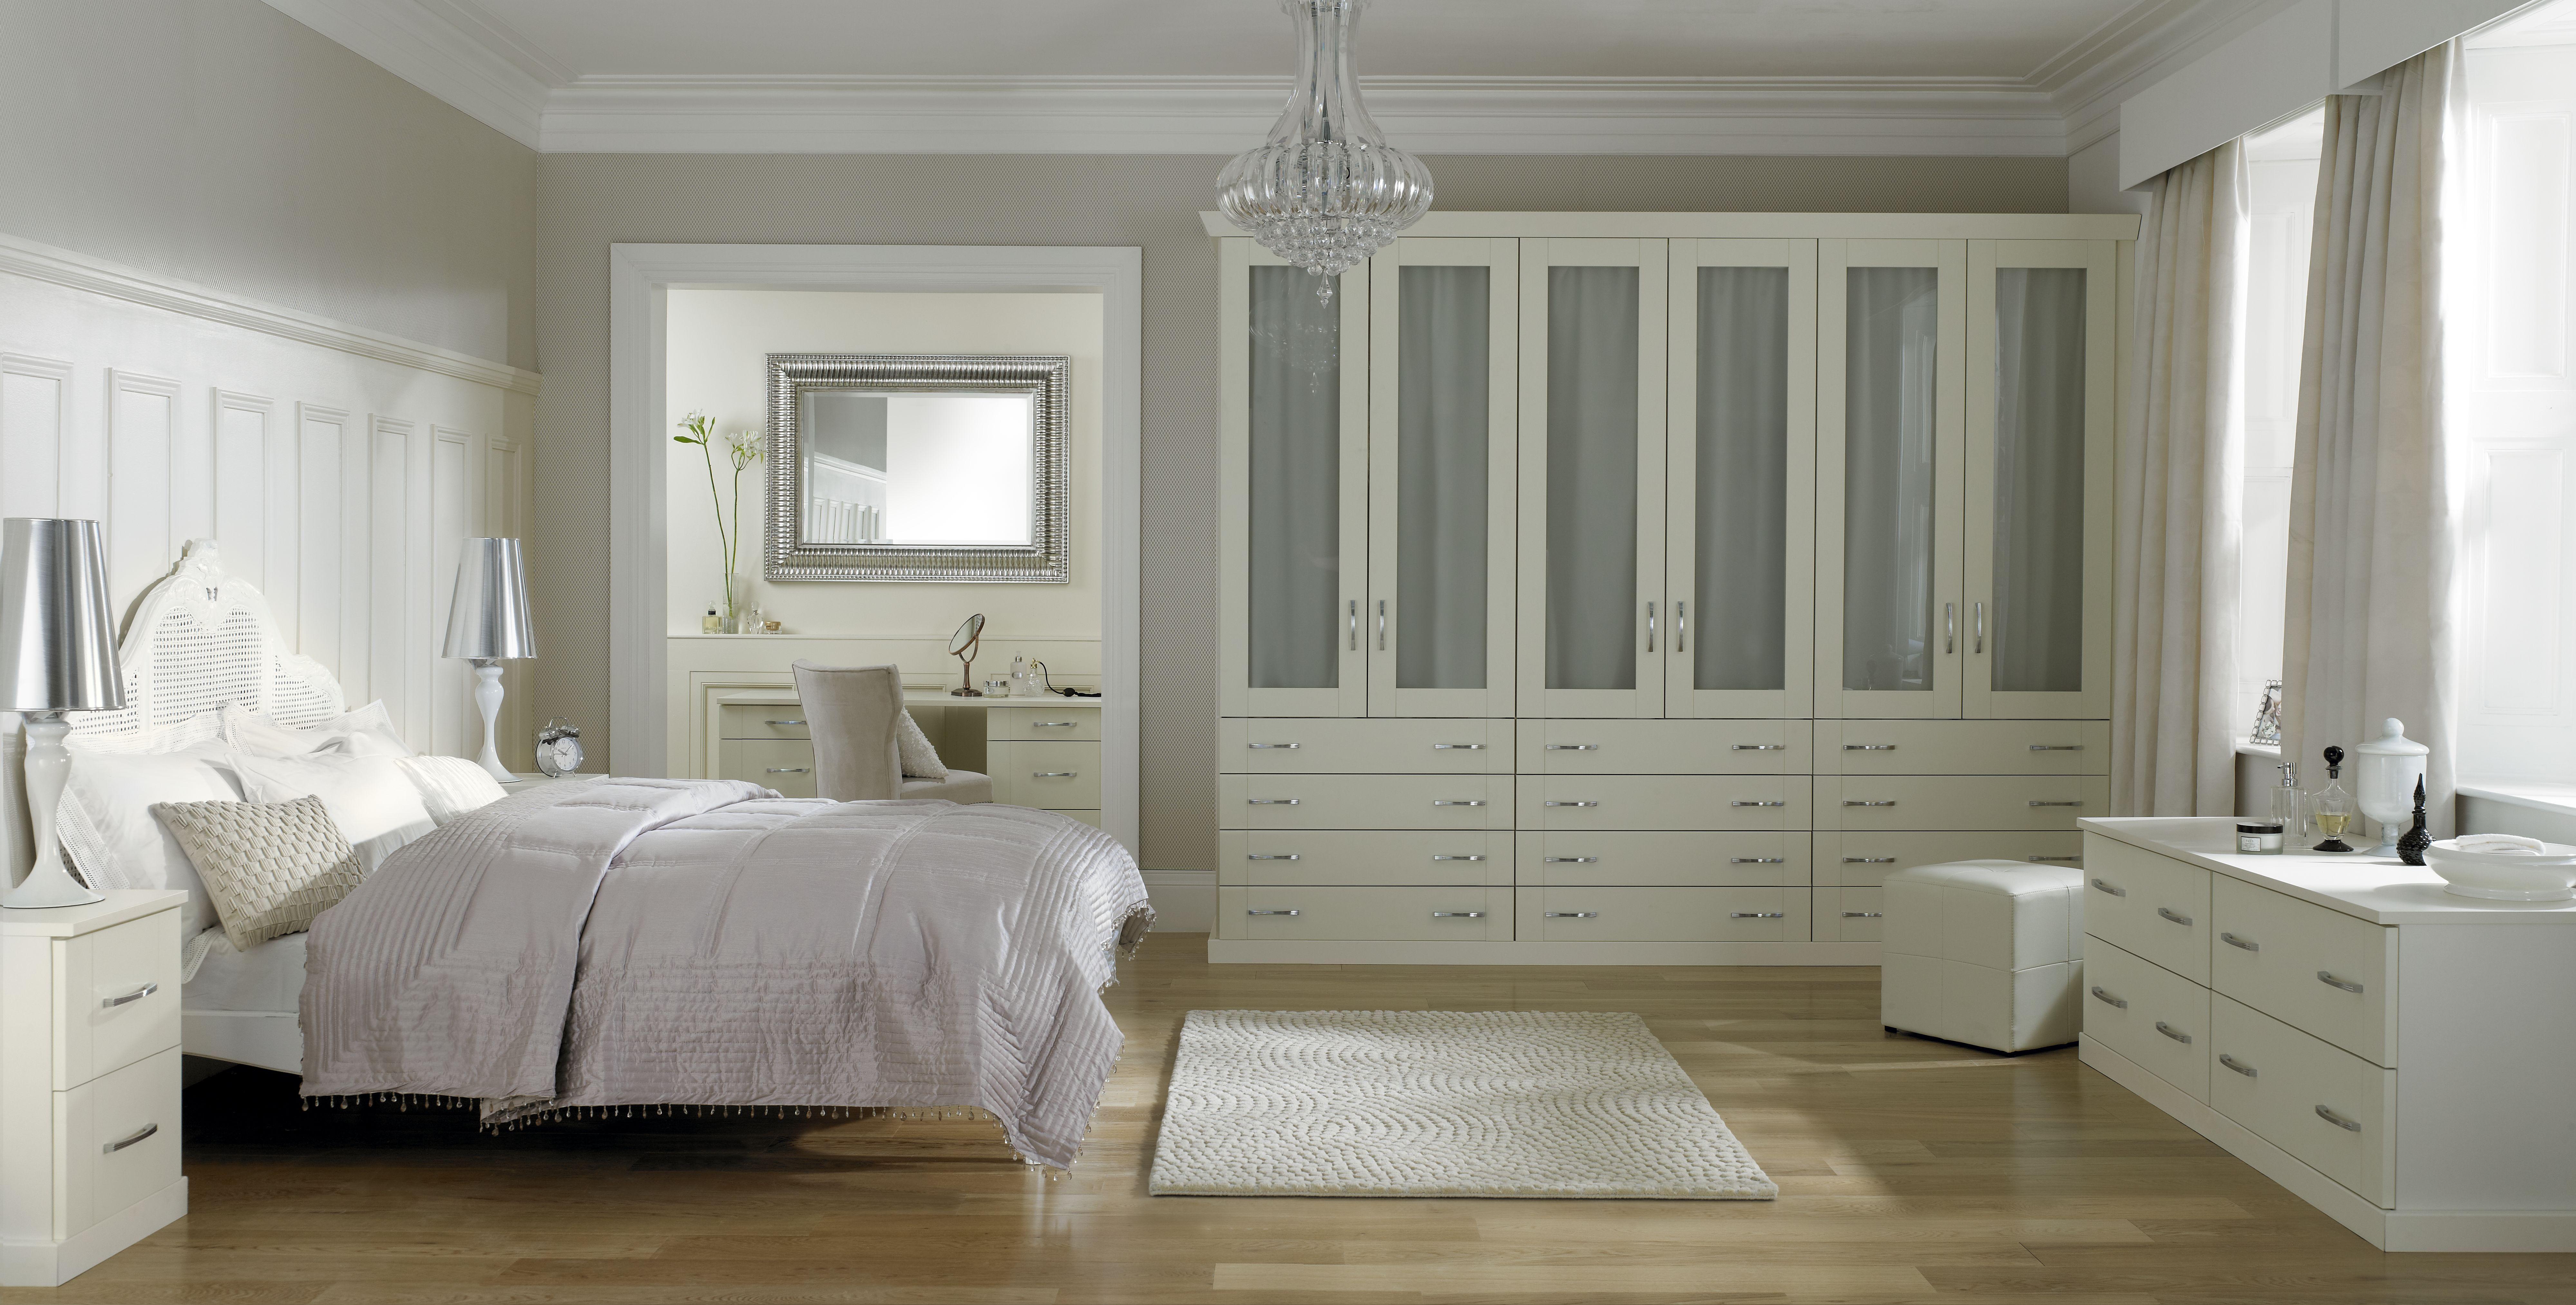 Nicole - Enjoy a classic ivory bedroom with the Nicola ...